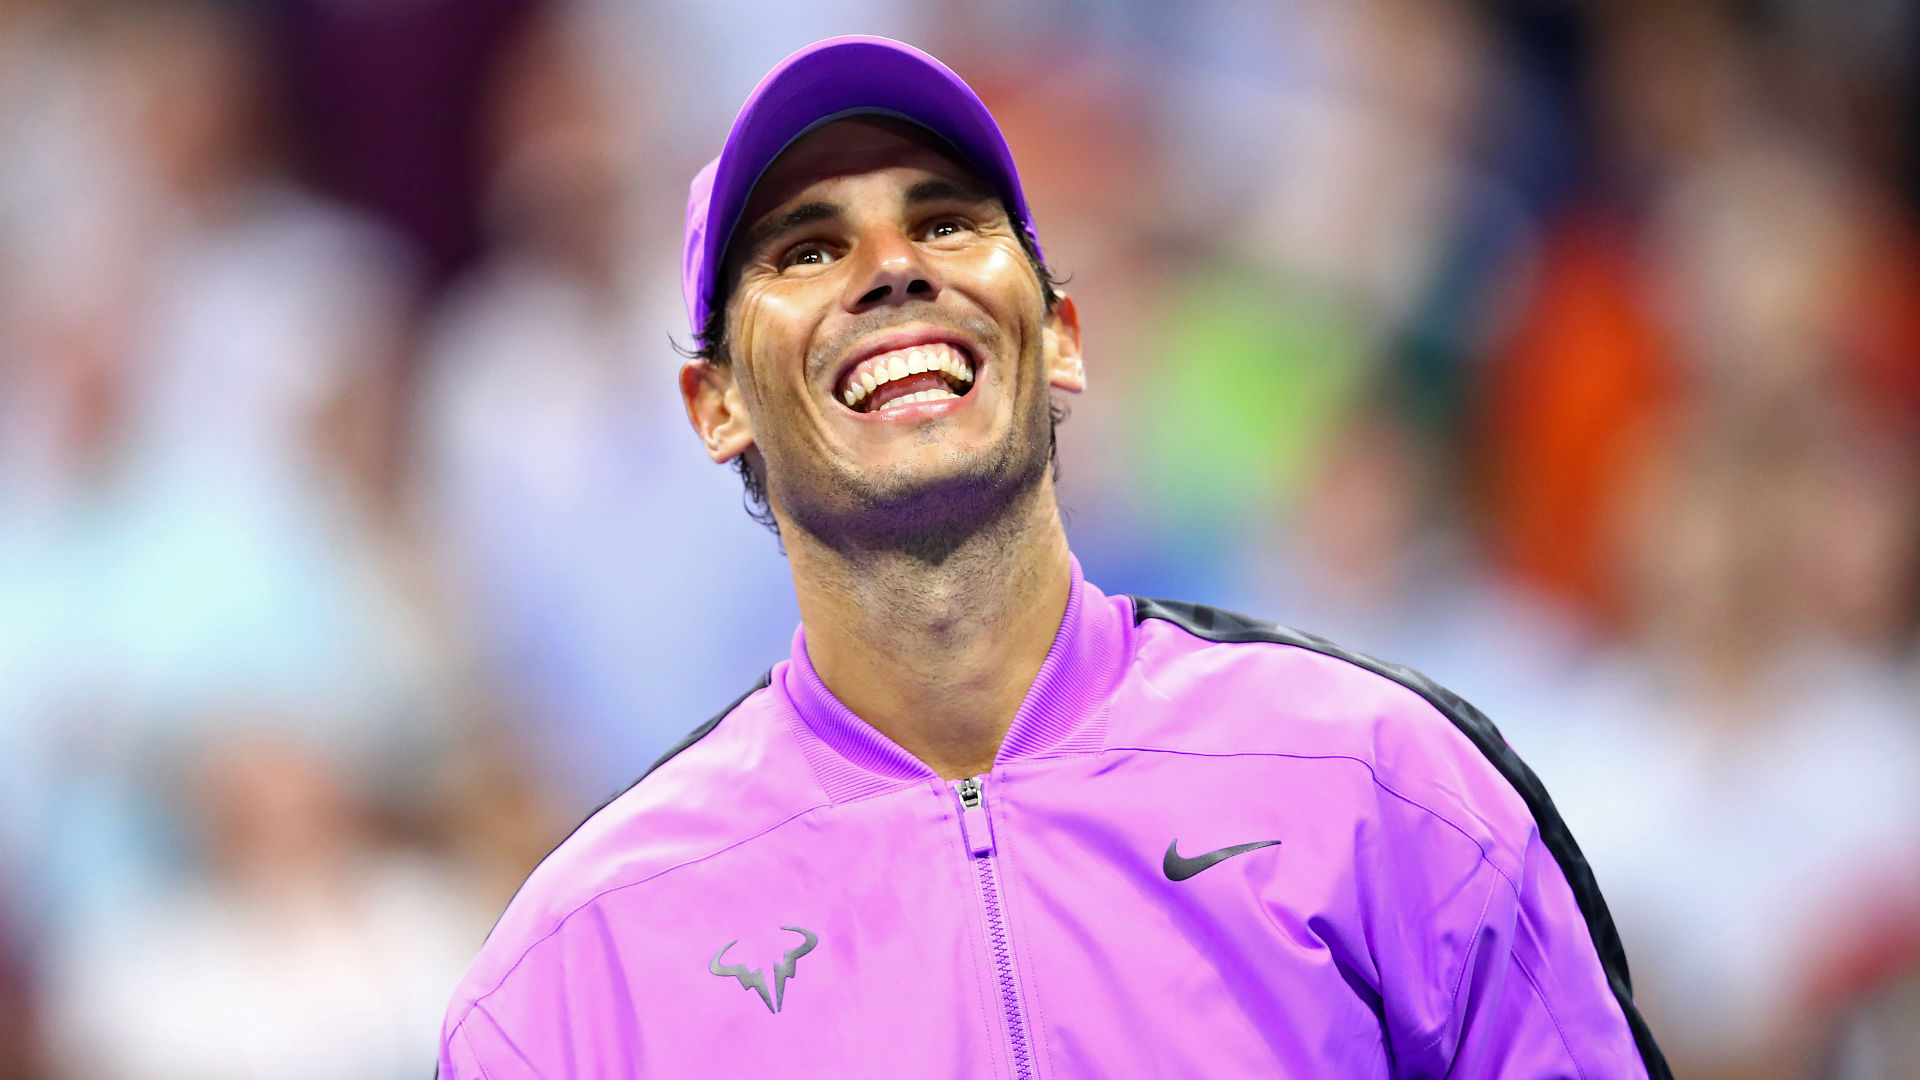 U.S. Open 2019: Rafael Nadal into Round 3 after Thanasi Kokkinakis withdrawal